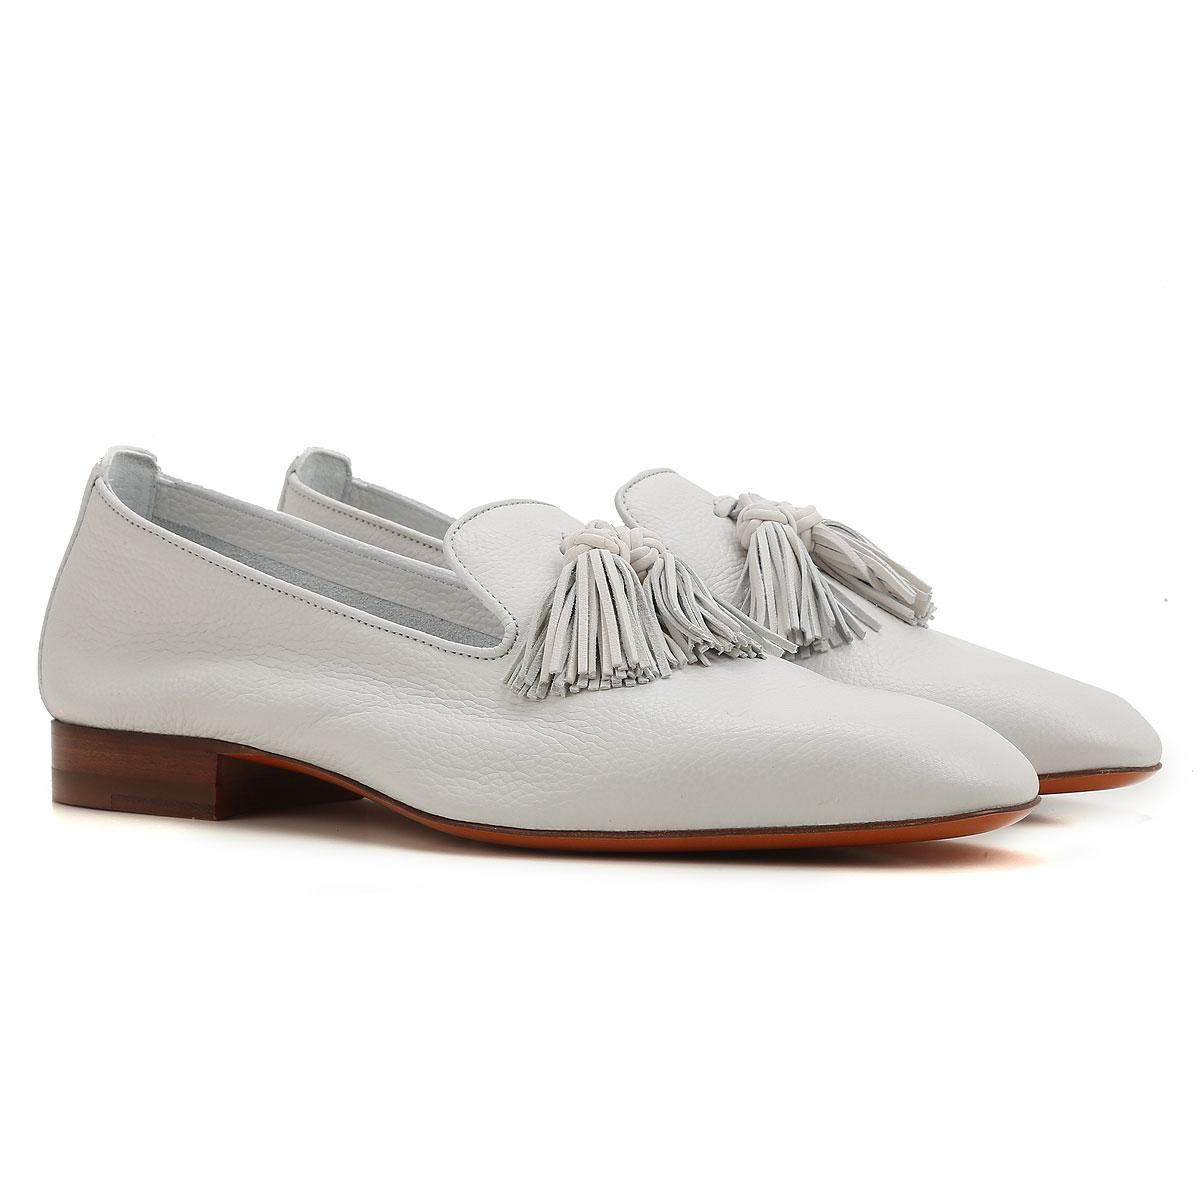 0e0439ba6d7 Lyst - Santoni Shoes For Women in White